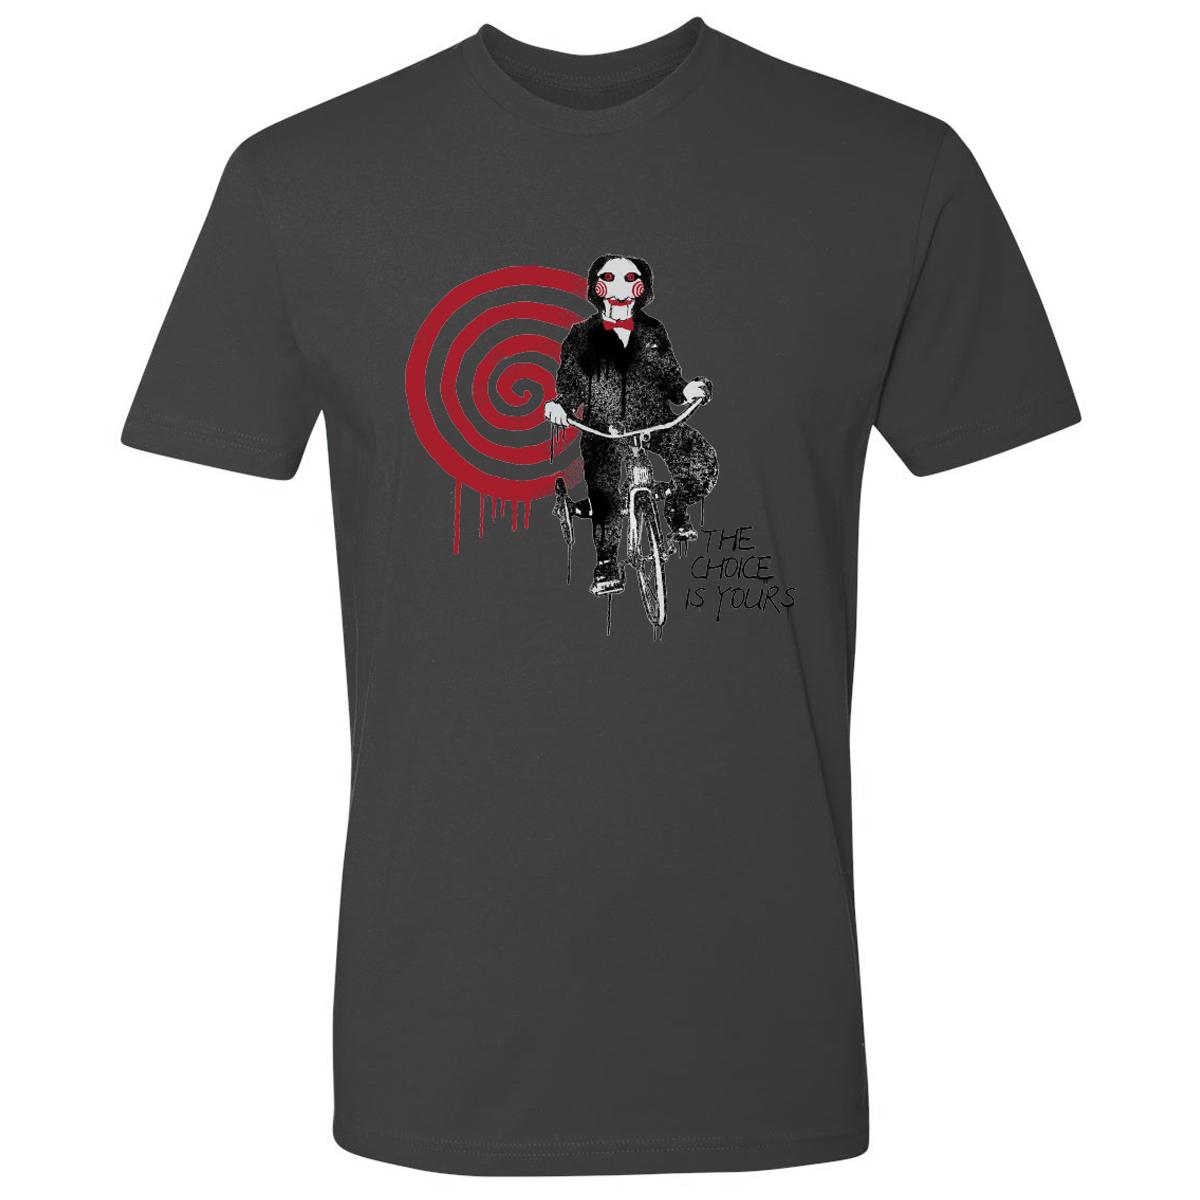 Saw The Choice T-Shirt